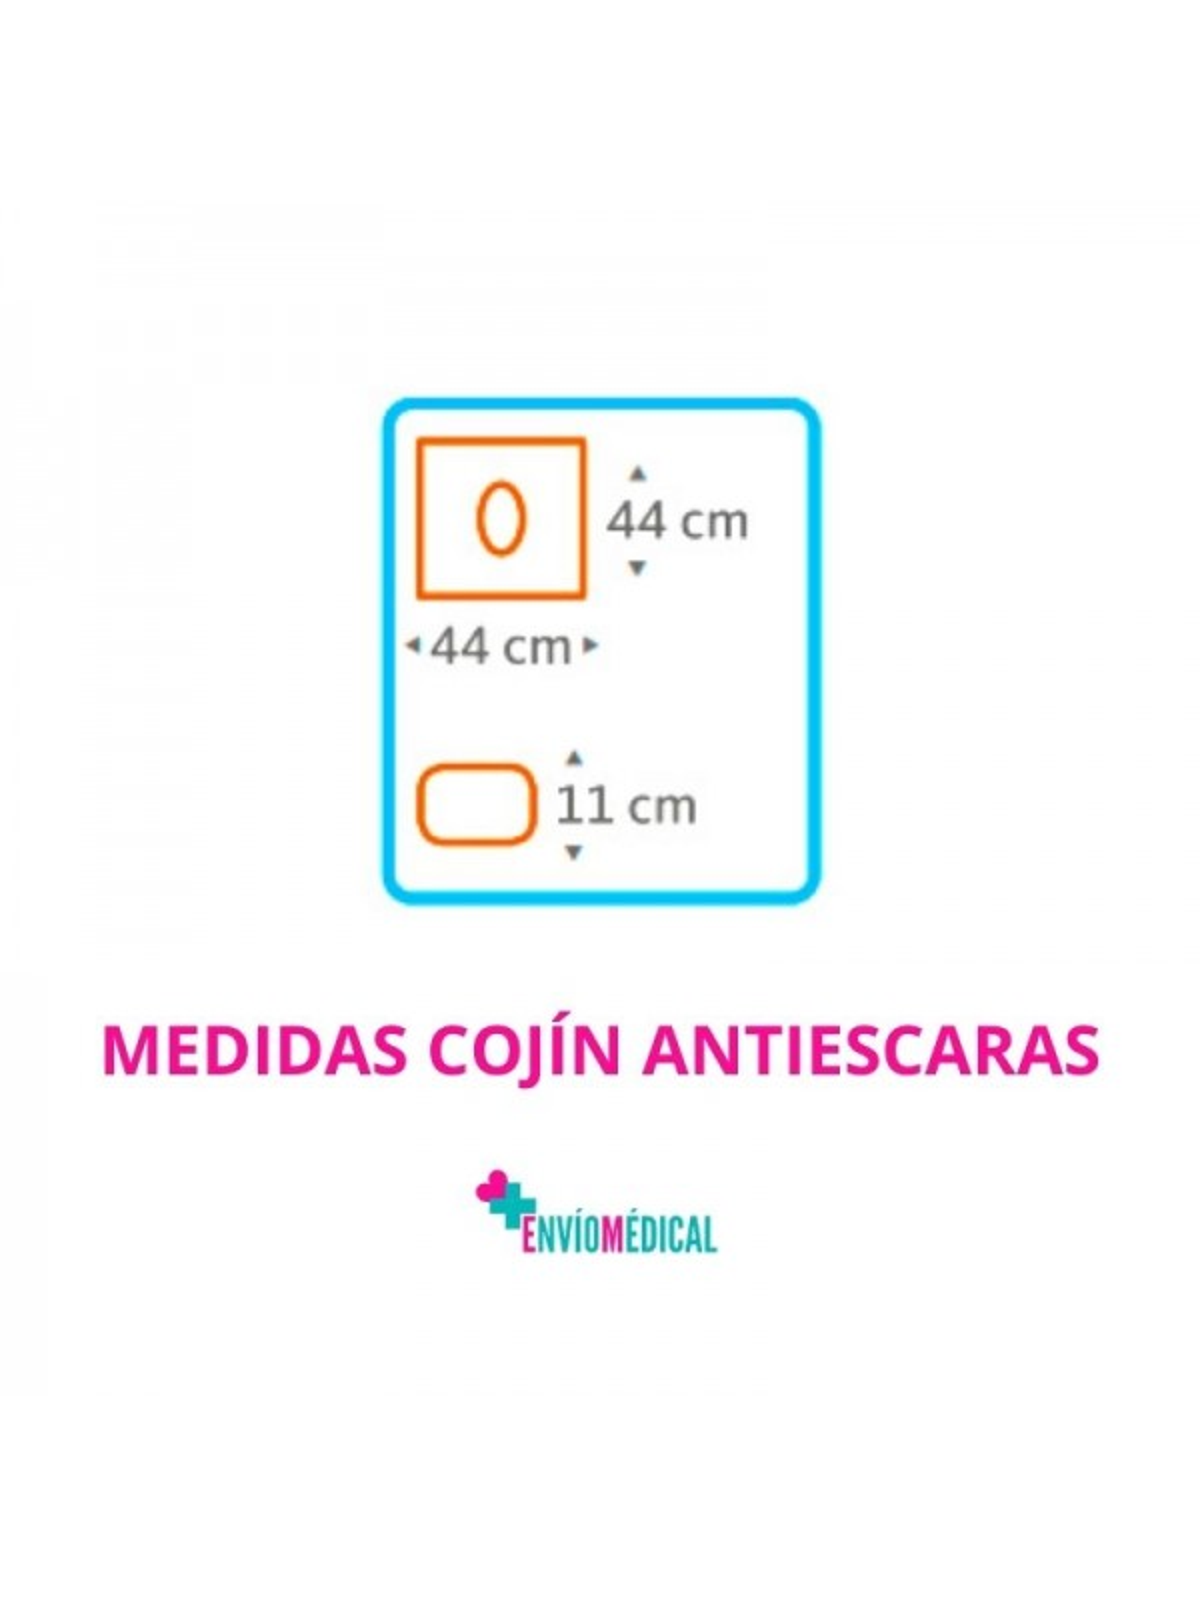 Cojín Antiescaras Tech Cuadrado